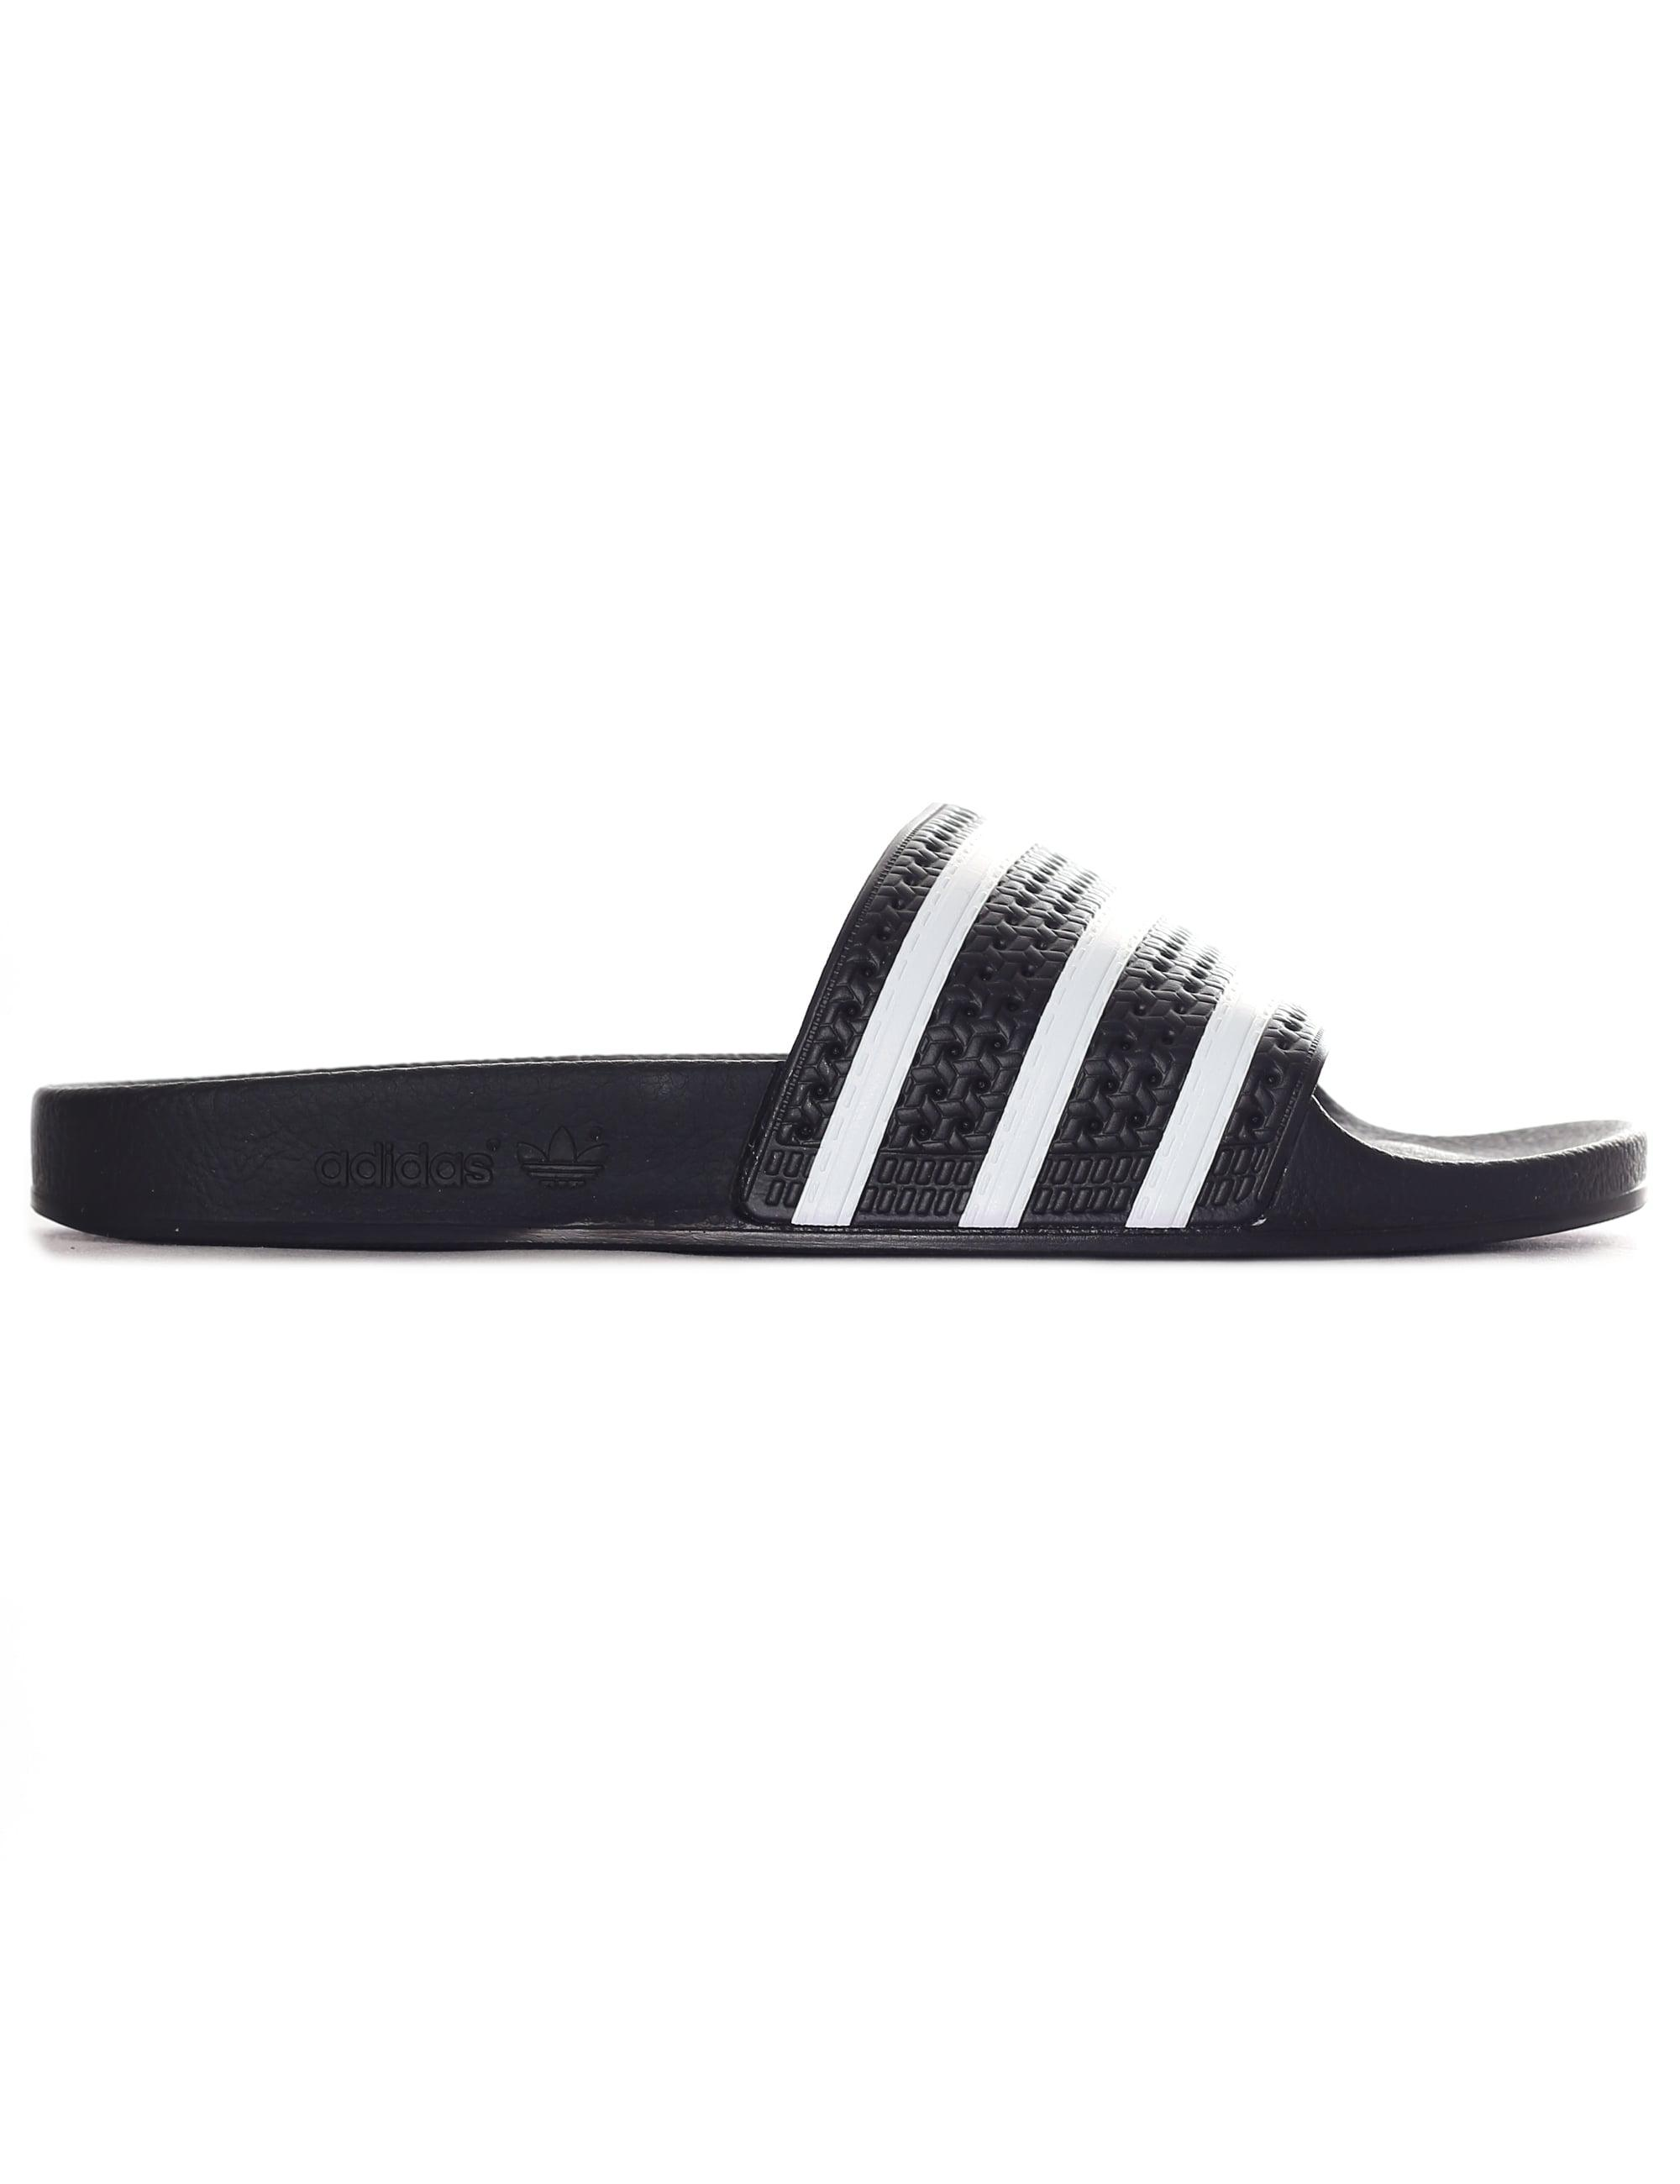 brand new 866e2 a41bd adidas. Men s Black And White Adilette Slides